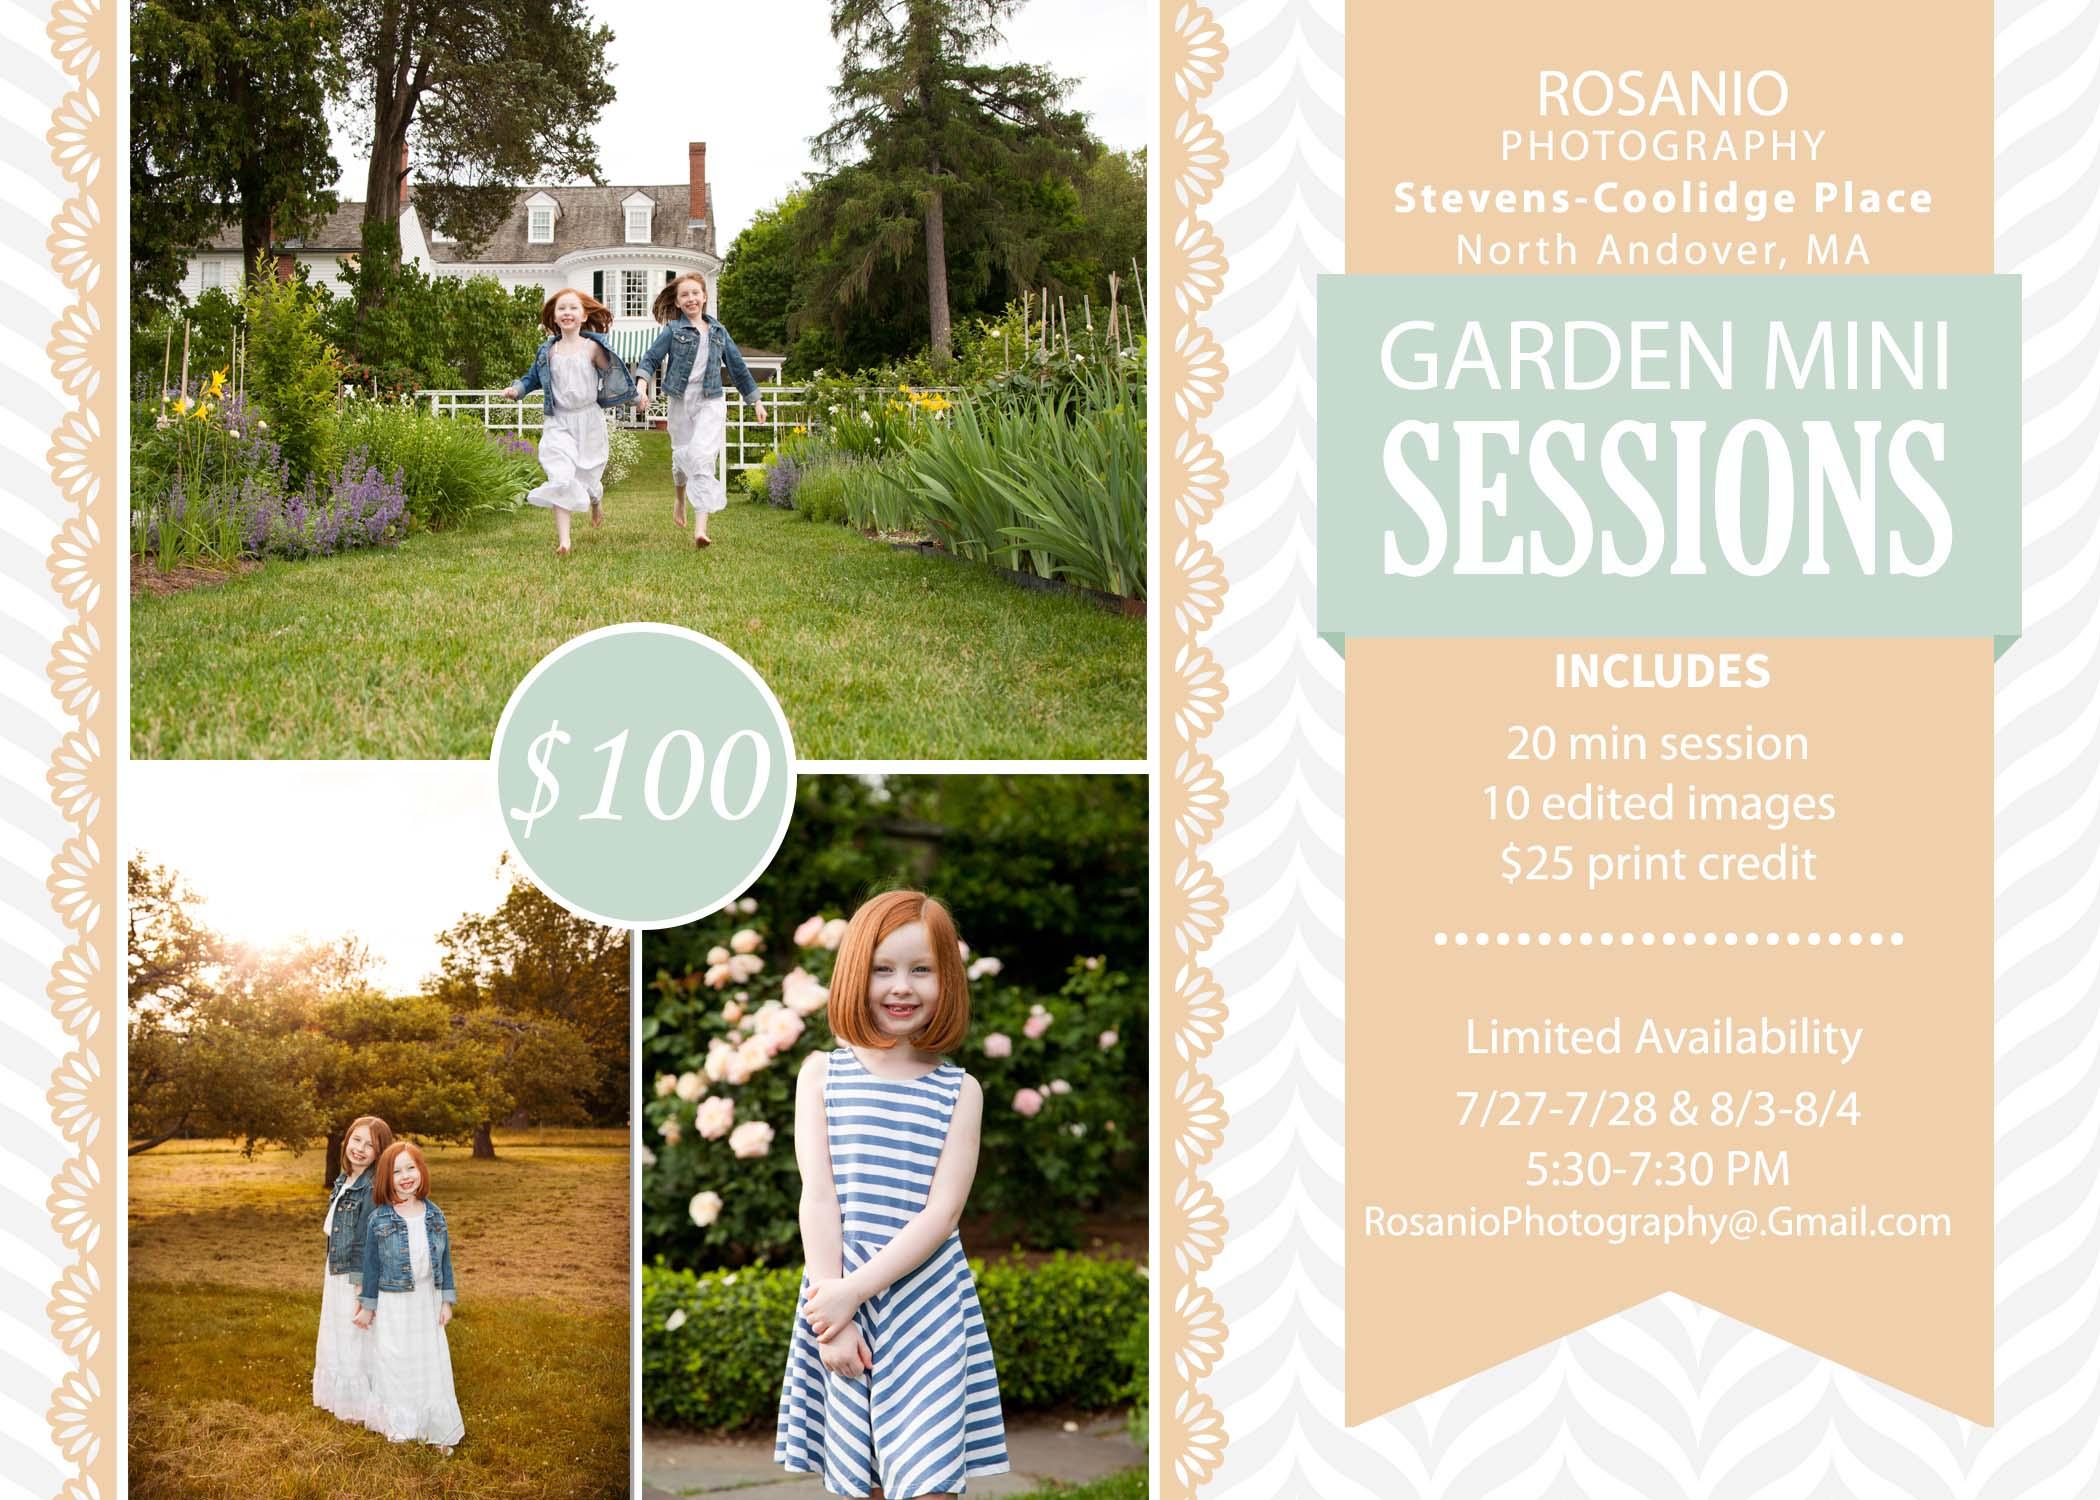 Rosanio Photography Garden Mini Sessions